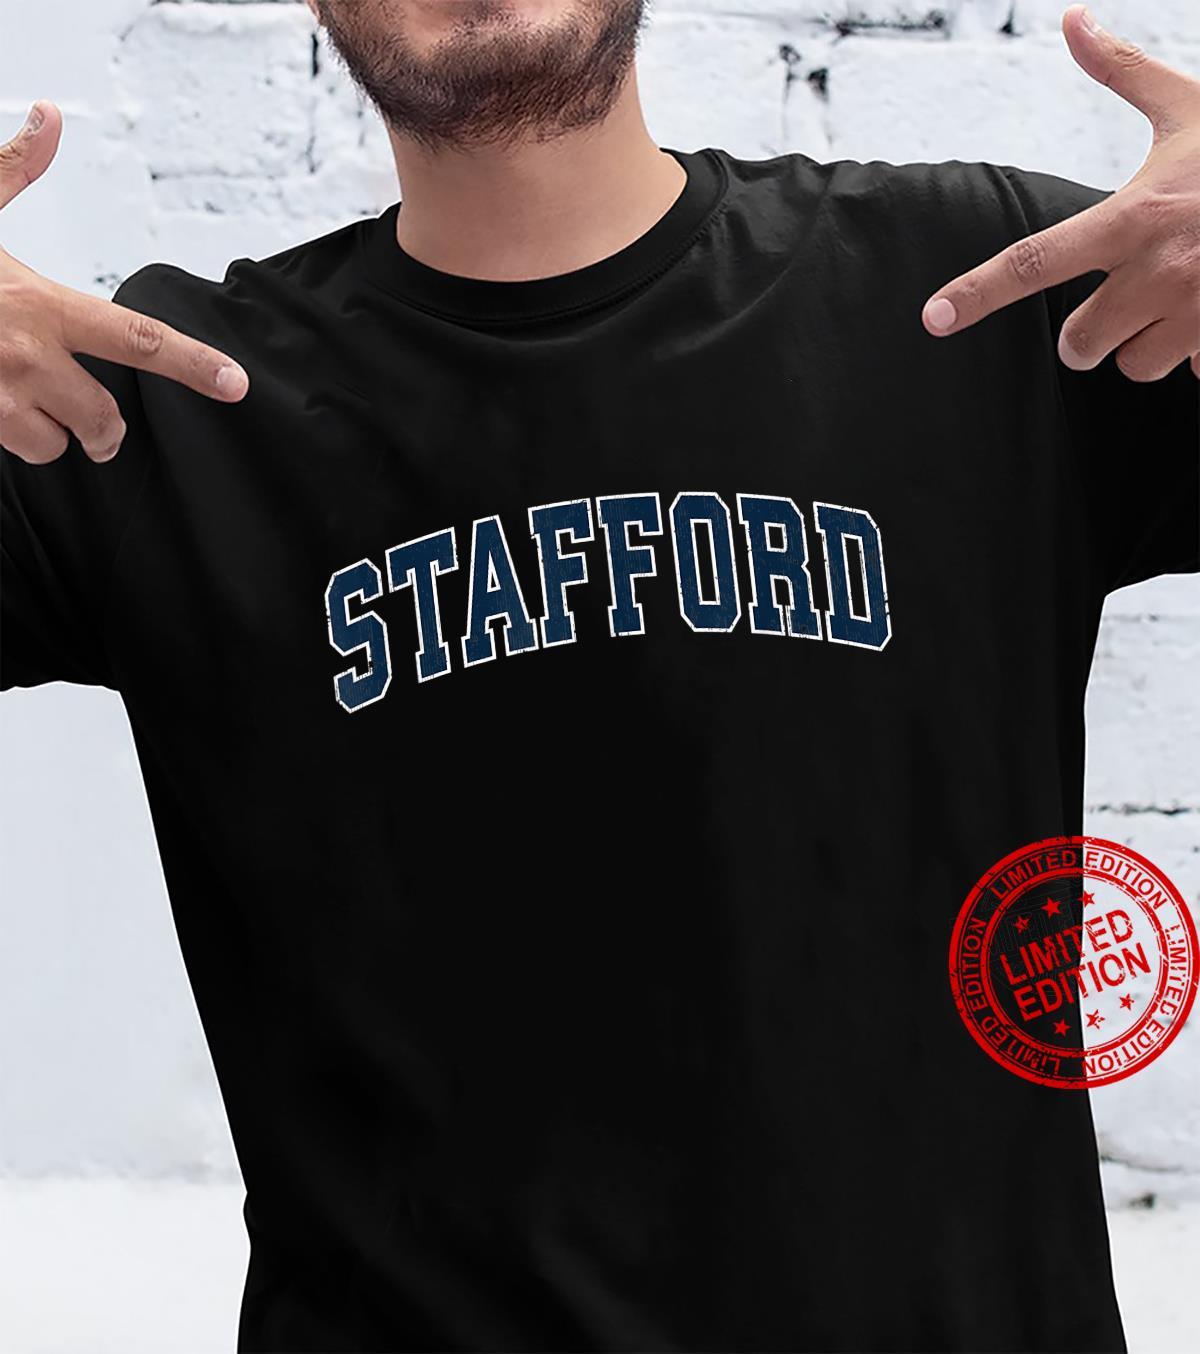 Stafford New Jersey NJ Vintage Sports Design Navy Design Shirt